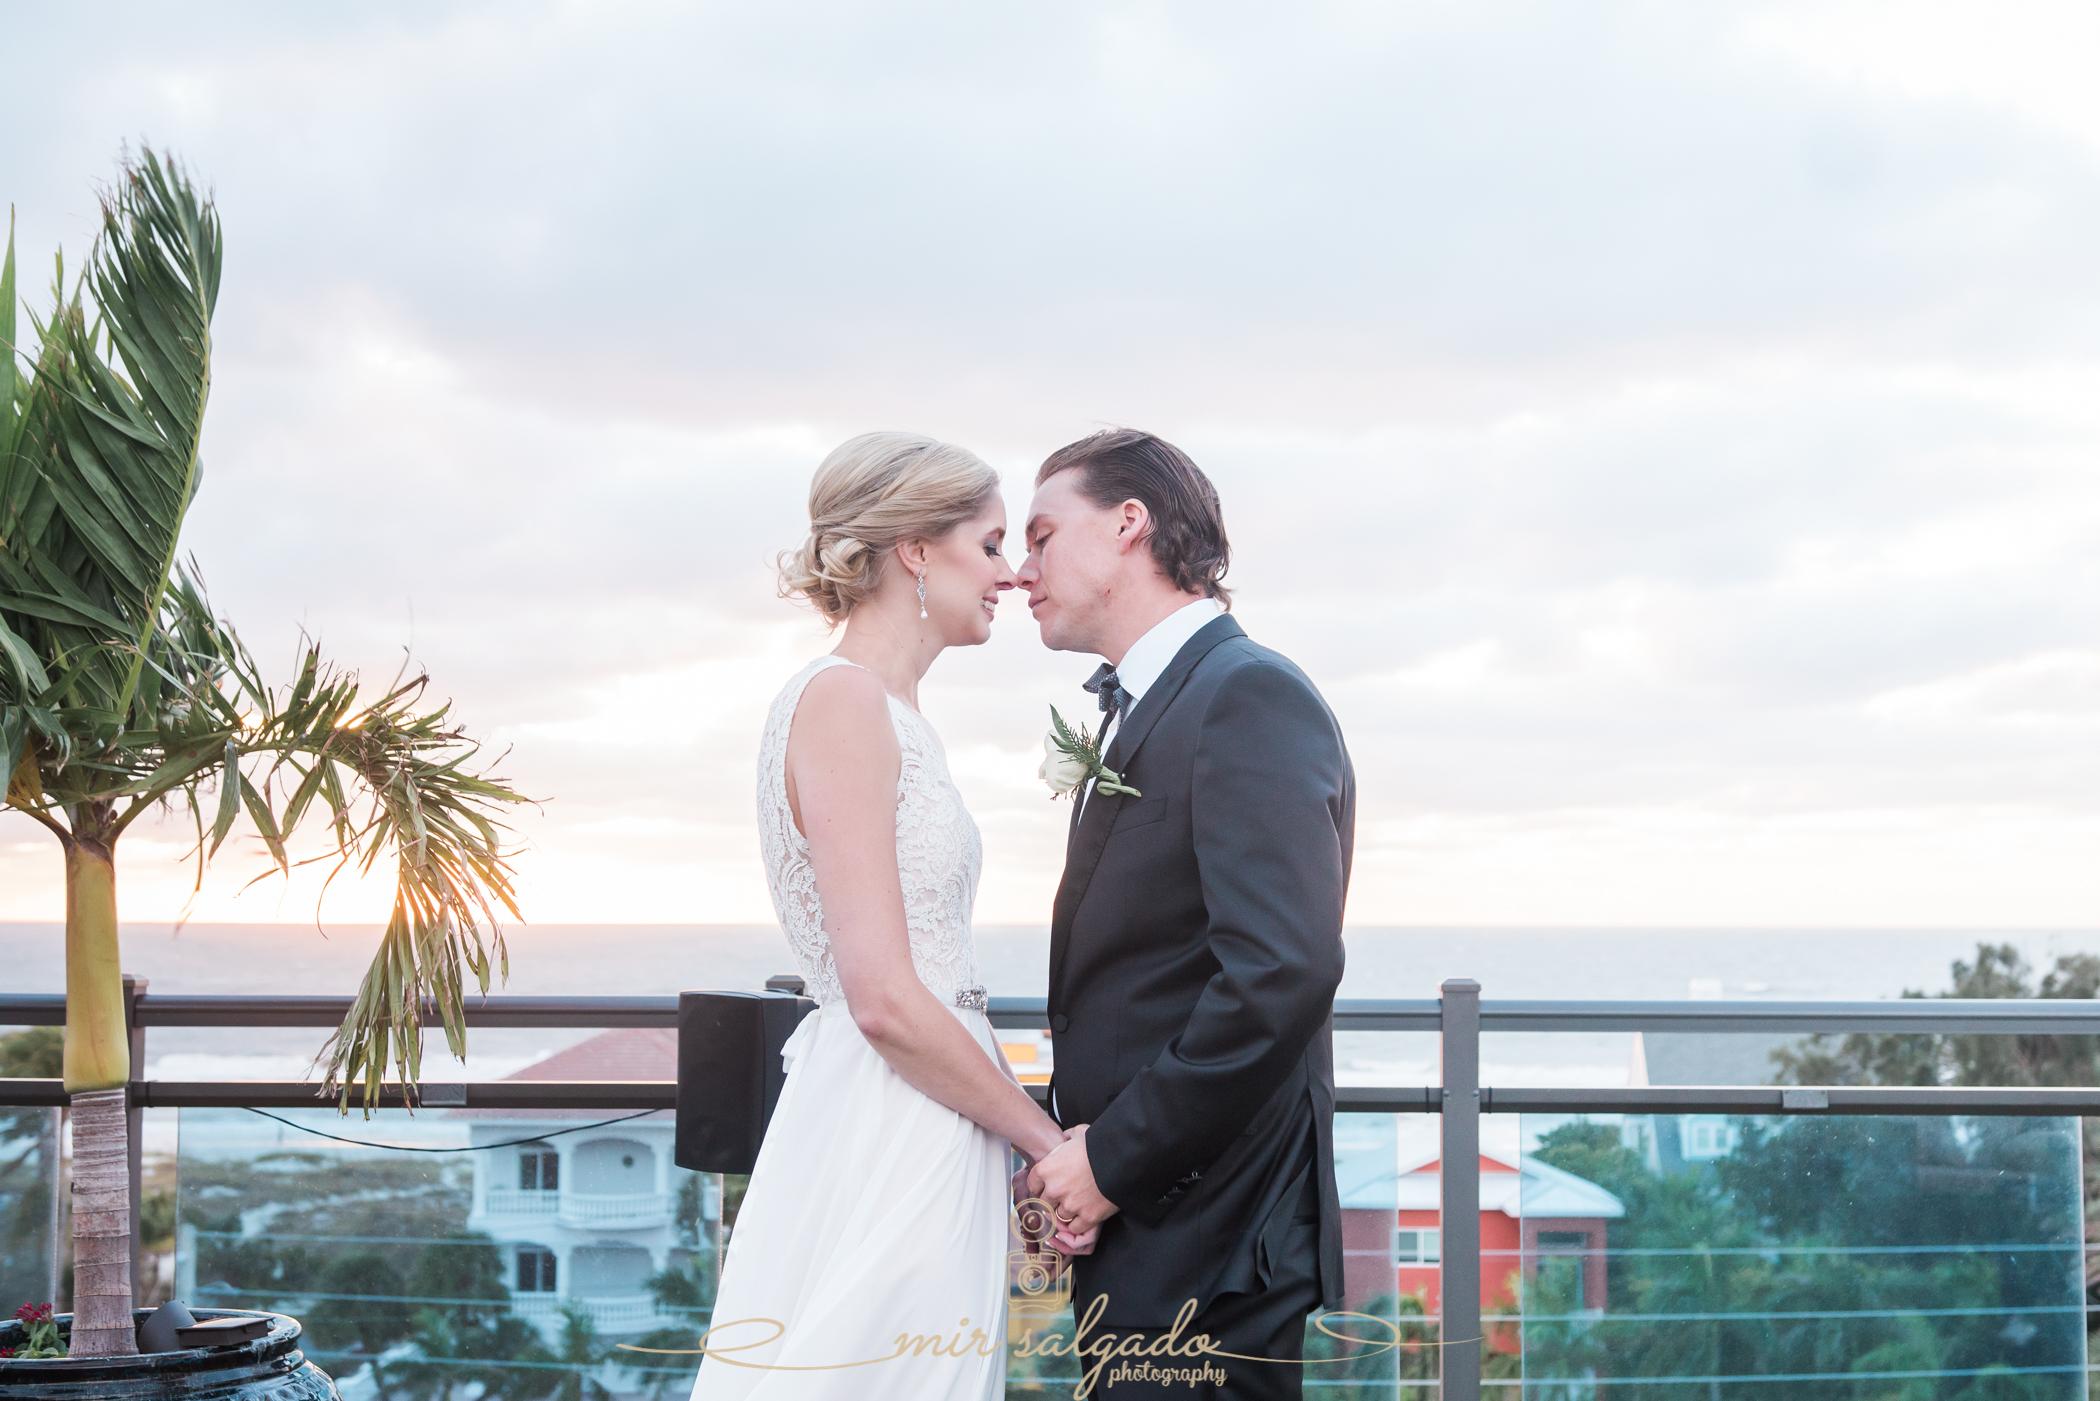 Hotel-Zamora-wedding, St.Pete-wedding-photographer, bride-and-groom-photo